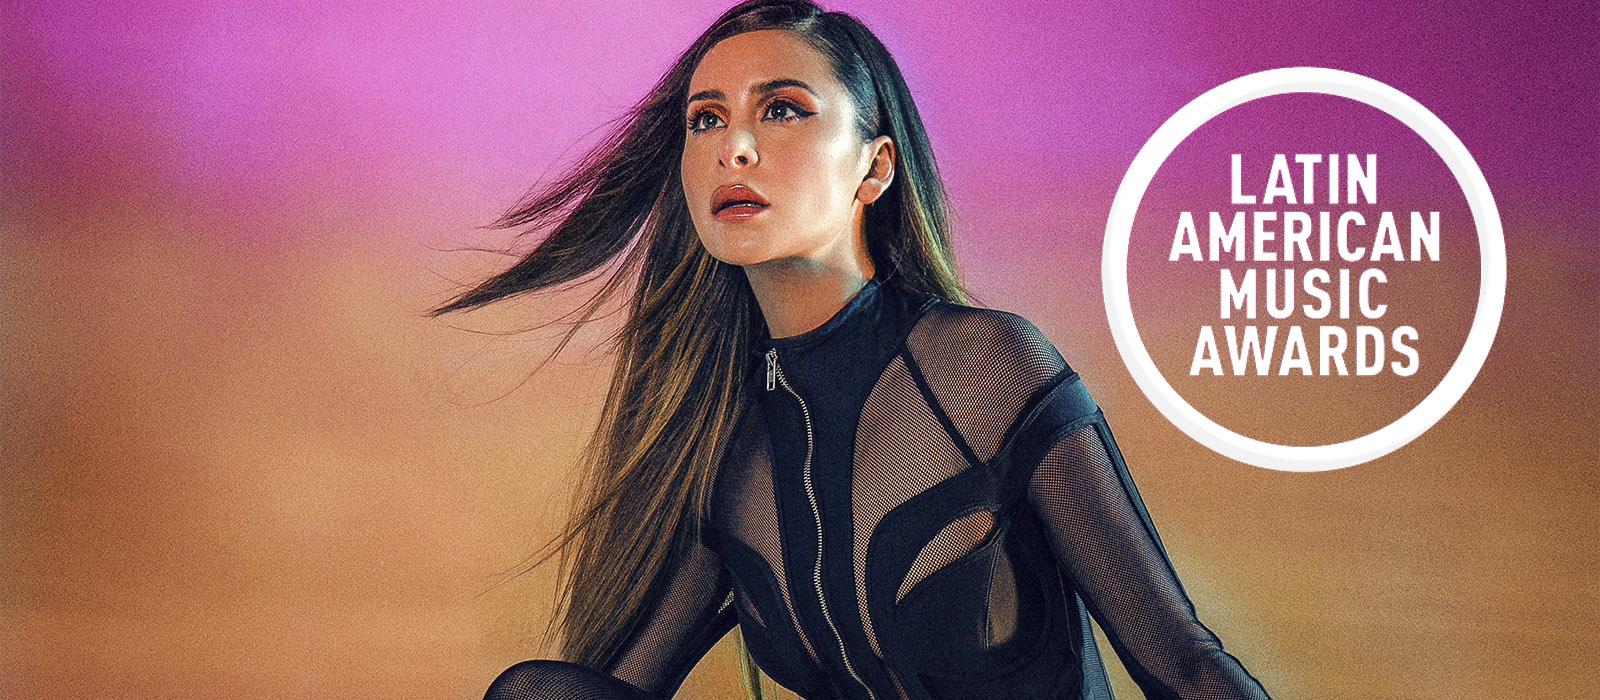 CAMI actuará en los Latin American Music Awards (Latin AMAs)